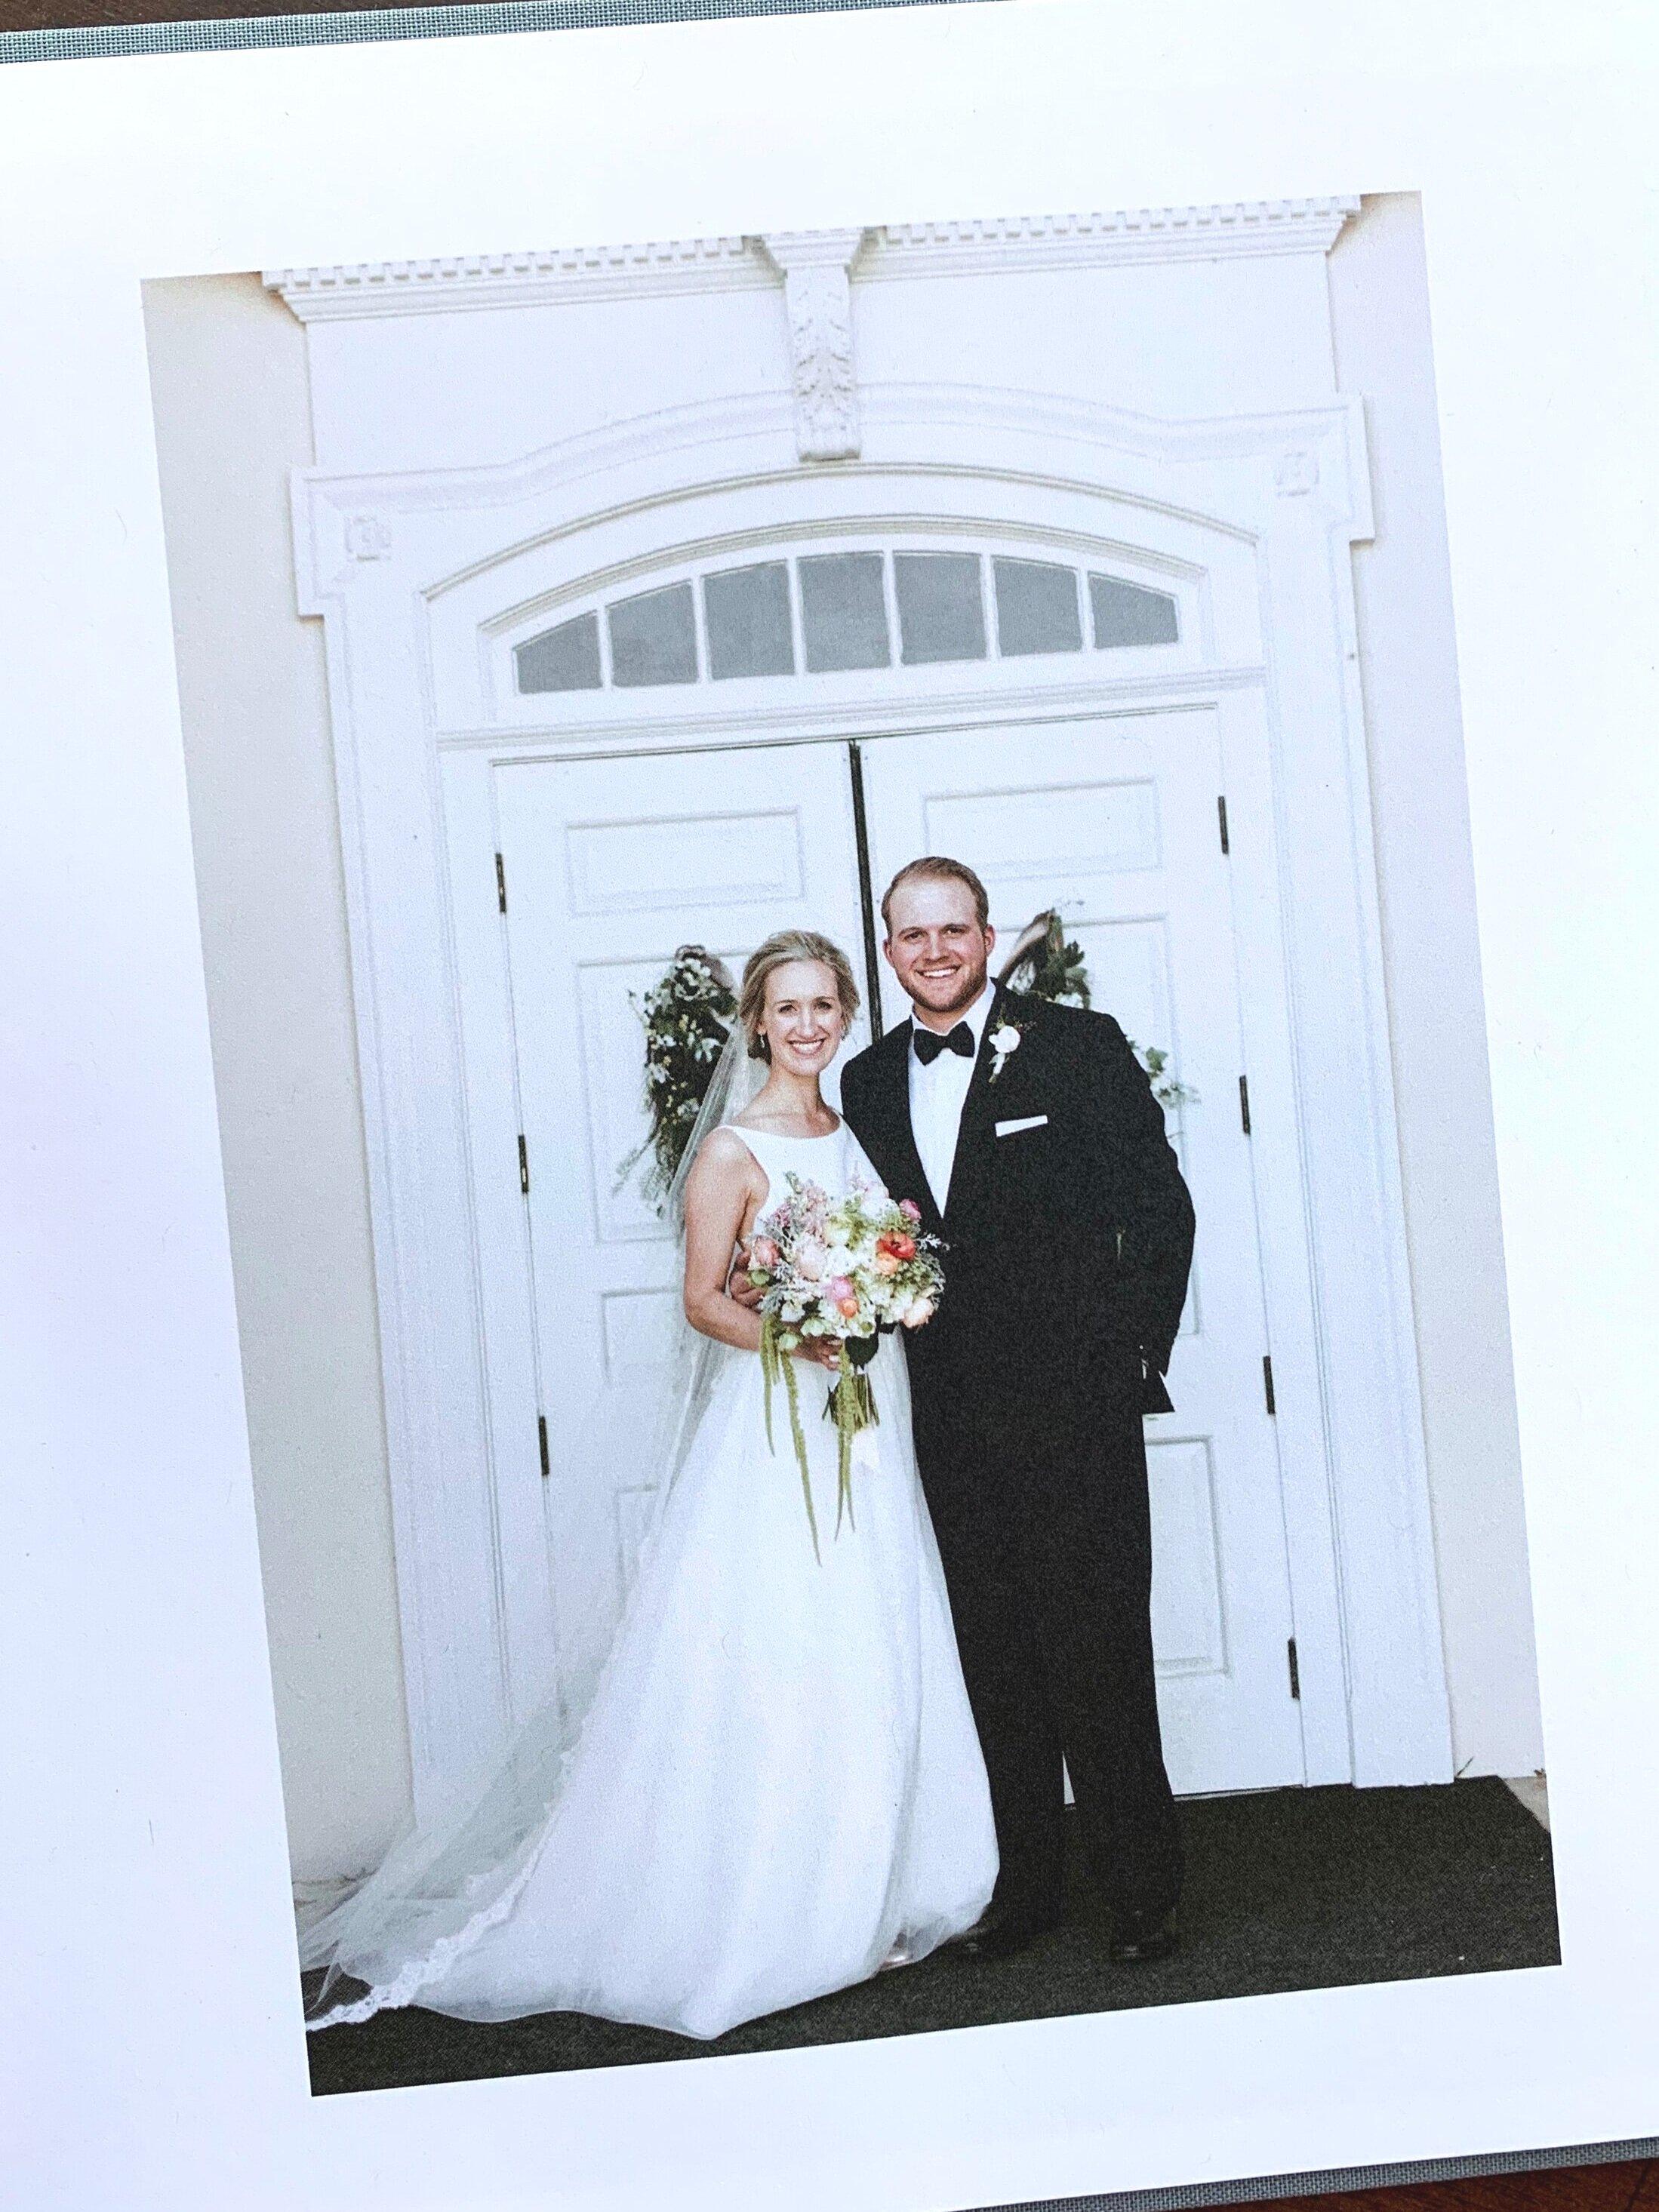 Celebrated 3 years of marriage with Dakota!